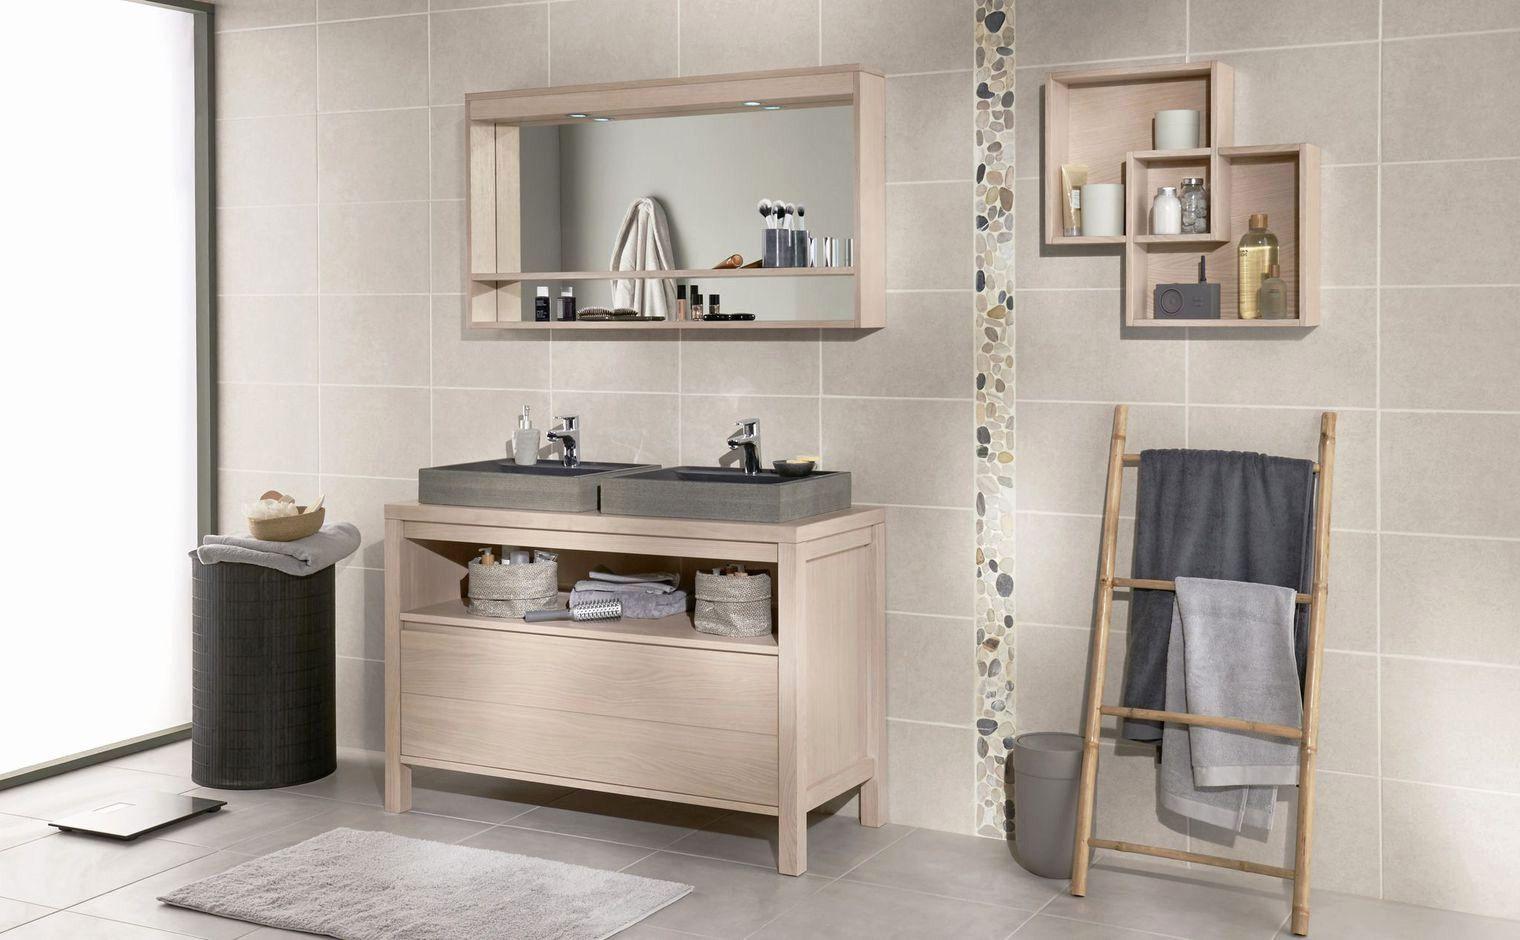 28 Luxe Salle De Bain Conforama Sous Vasque Bathroom Vanity Vanity Mirrored Furniture